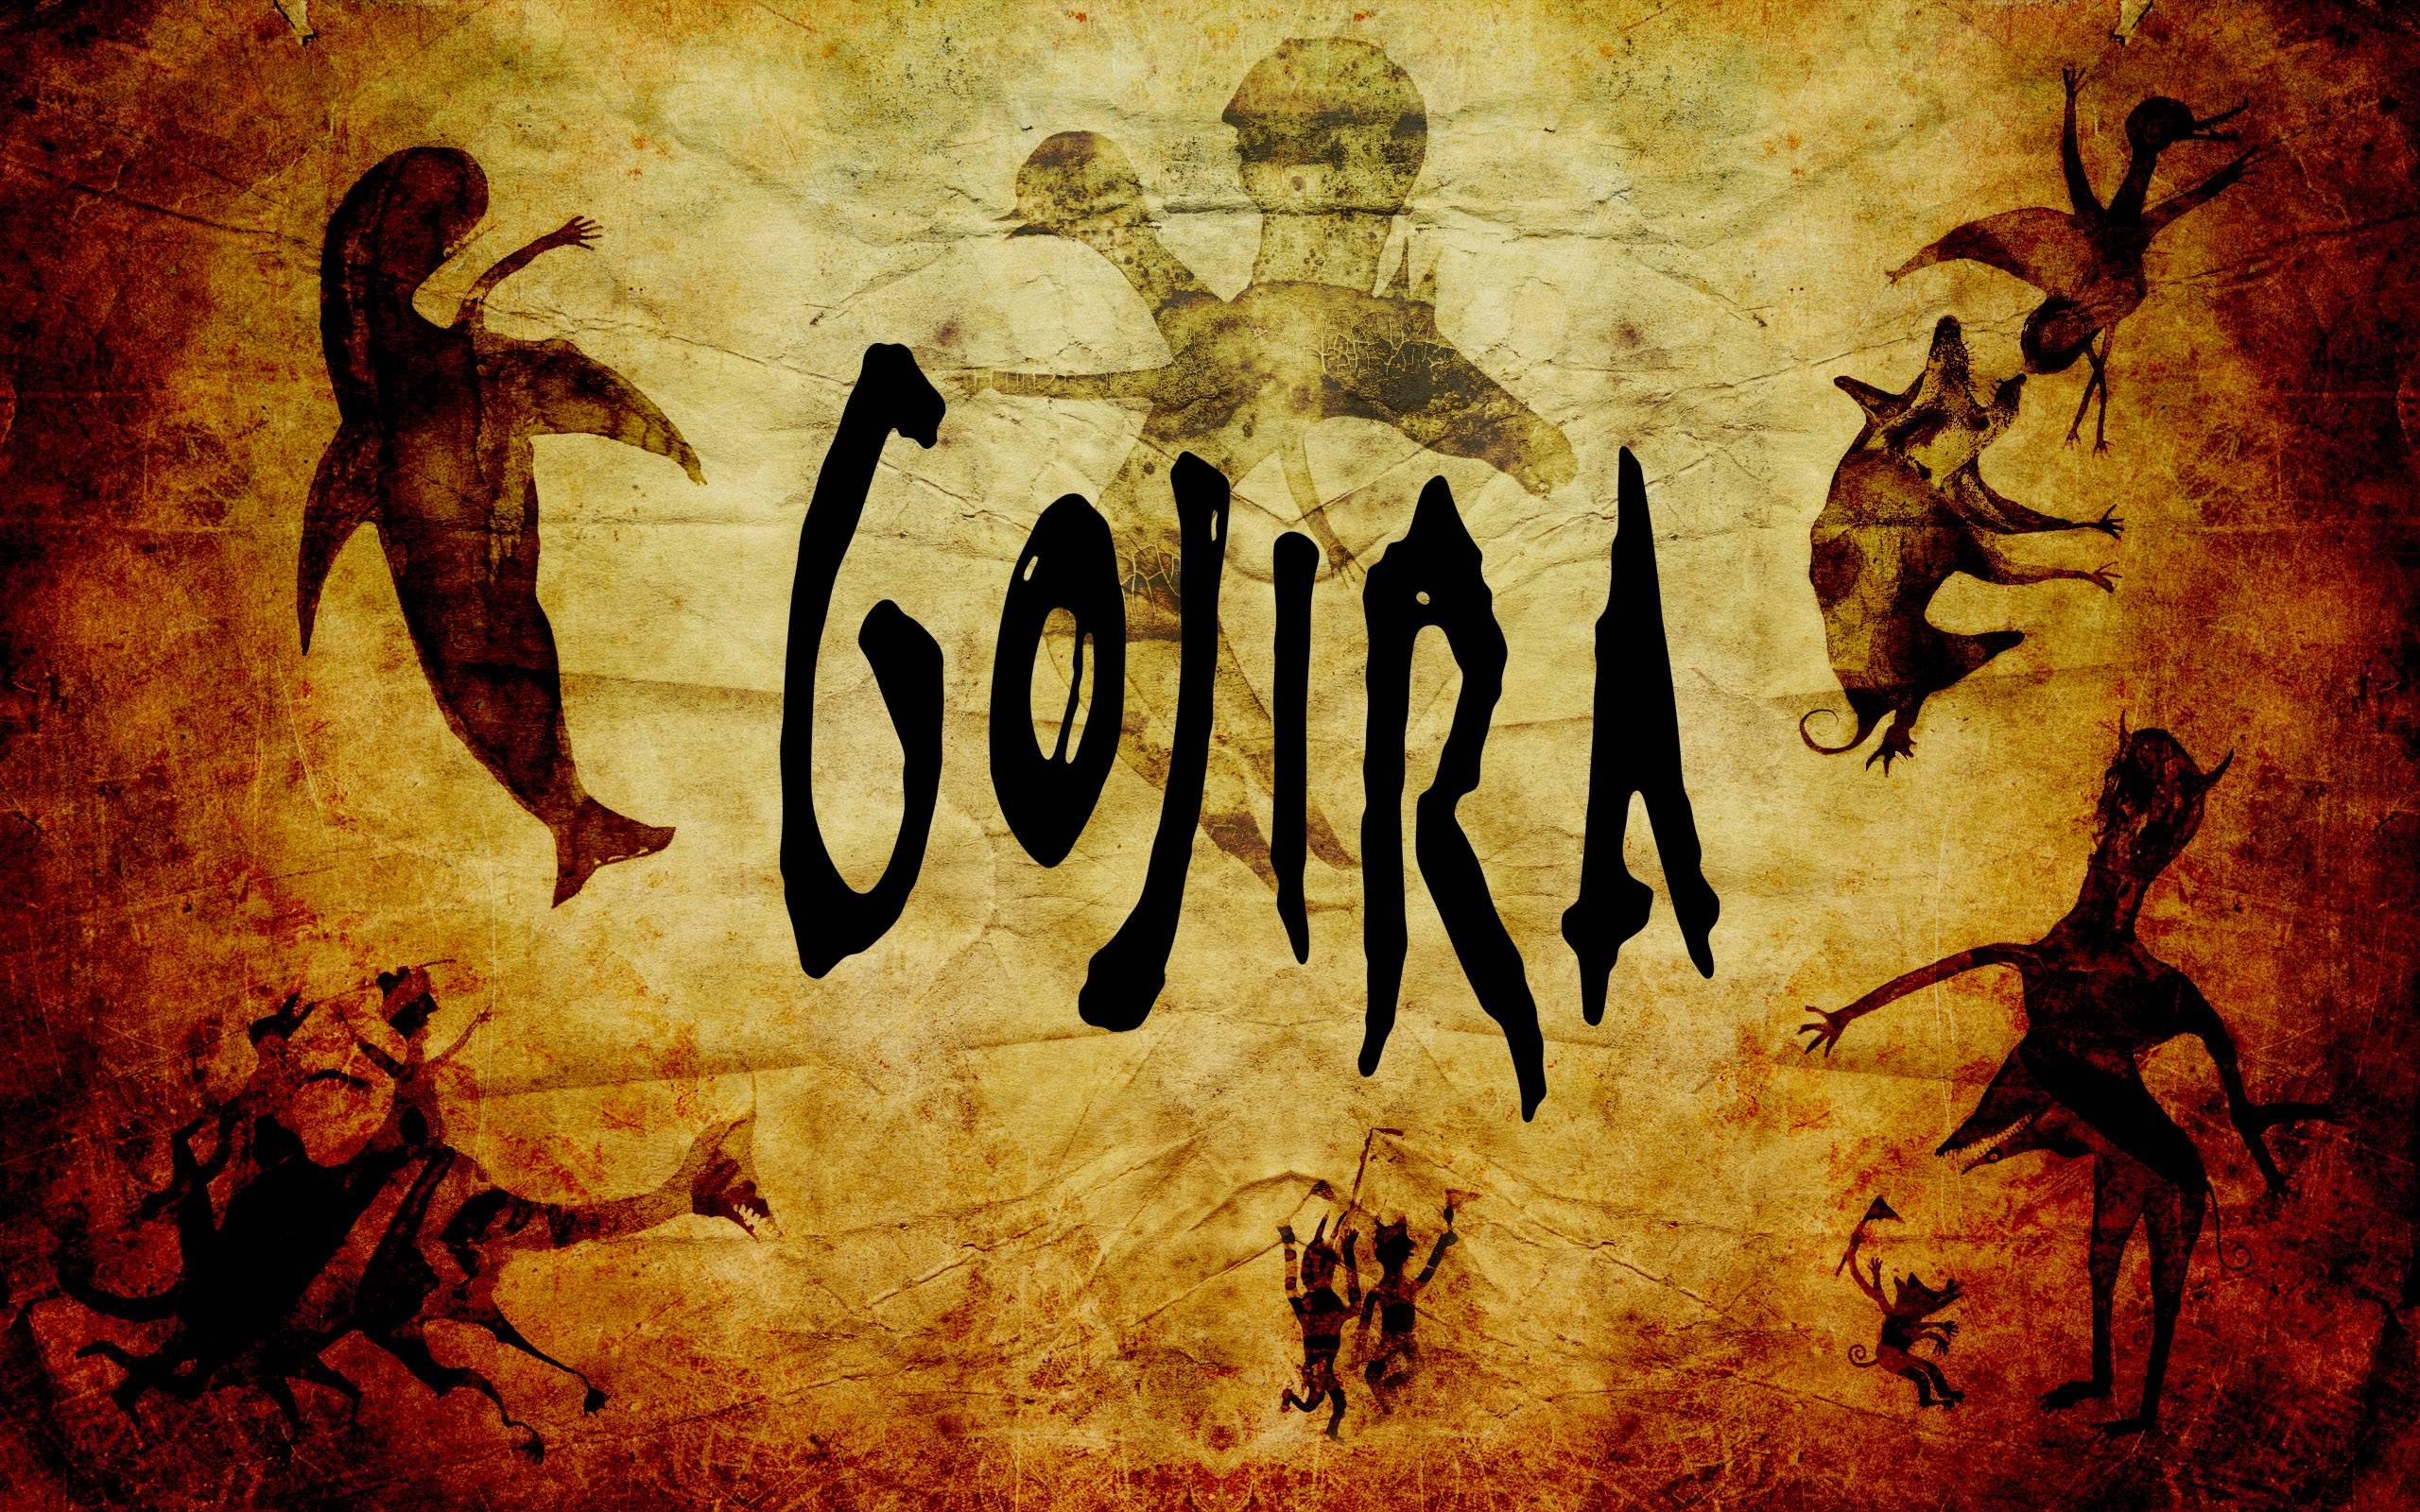 Gojira Wallpapers 2560x1600